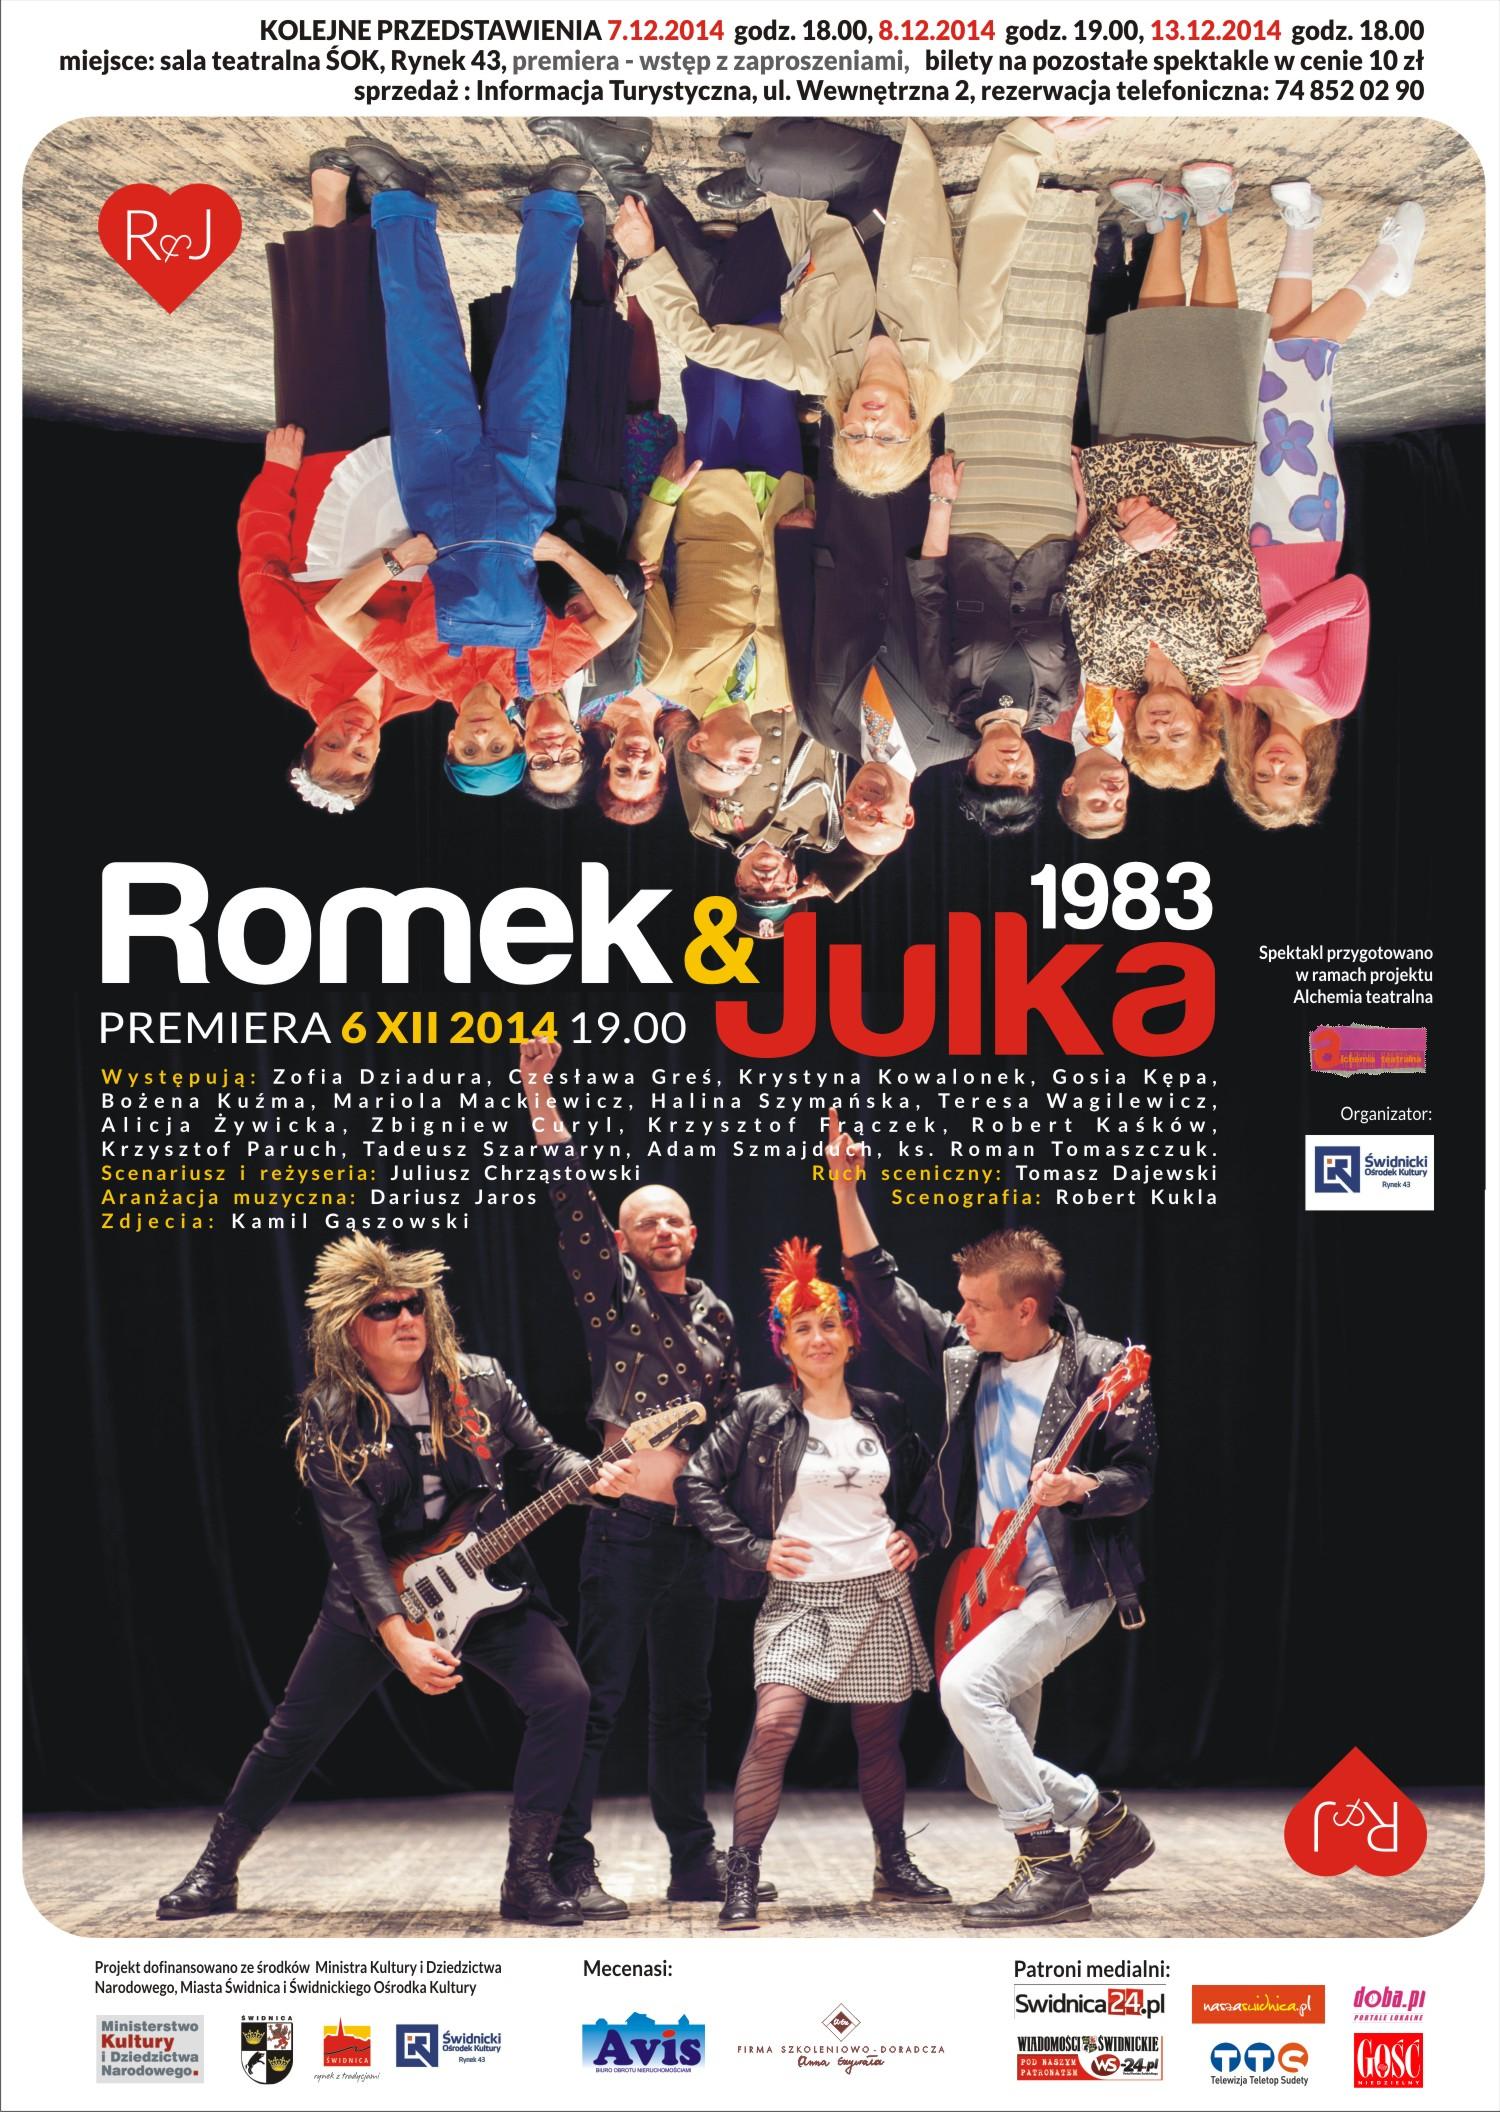 Alchemia Teatralna: Romek i Julka 1983 [spektakl]